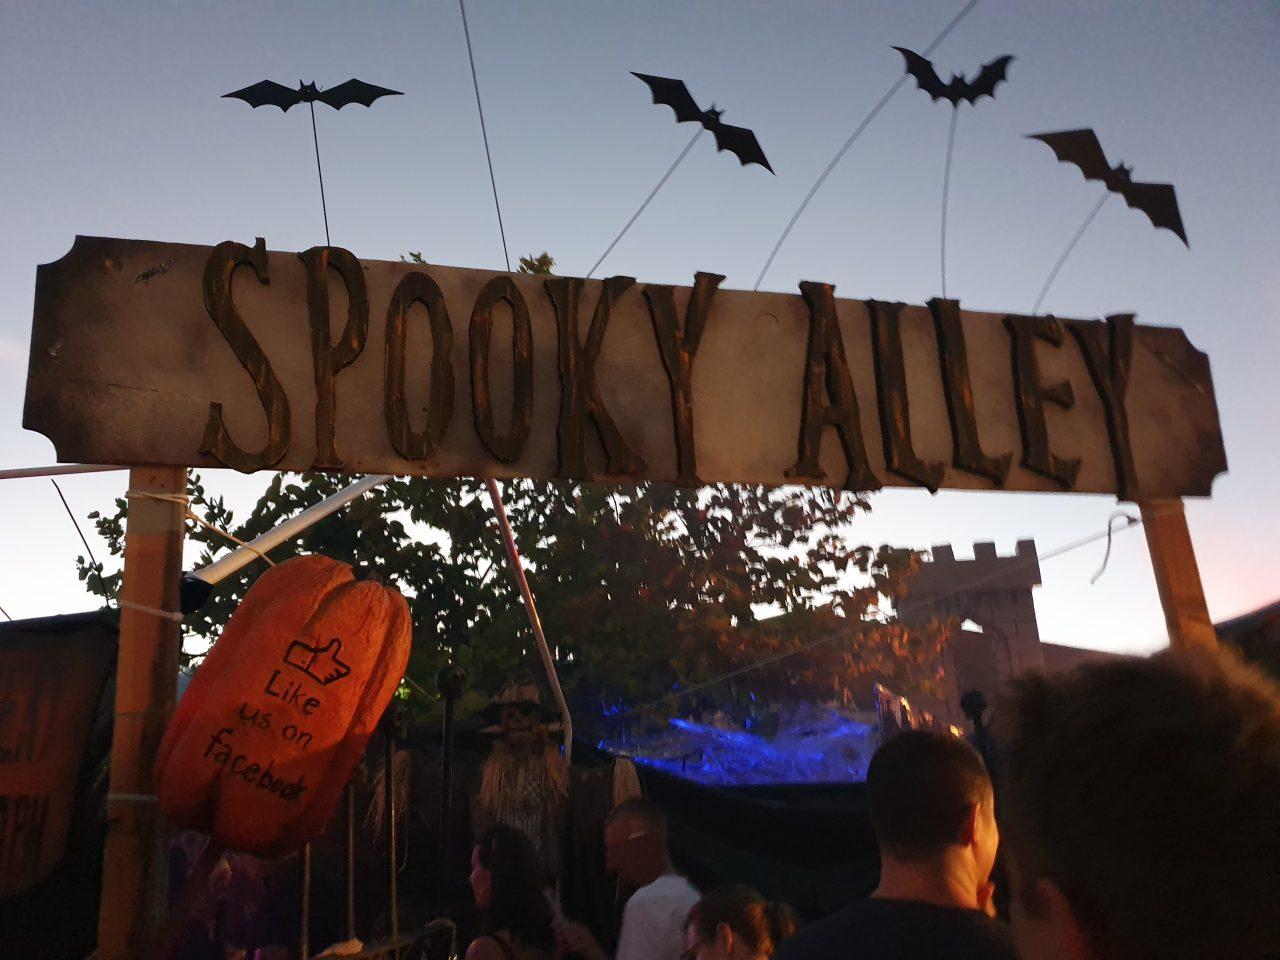 Spooky Alley